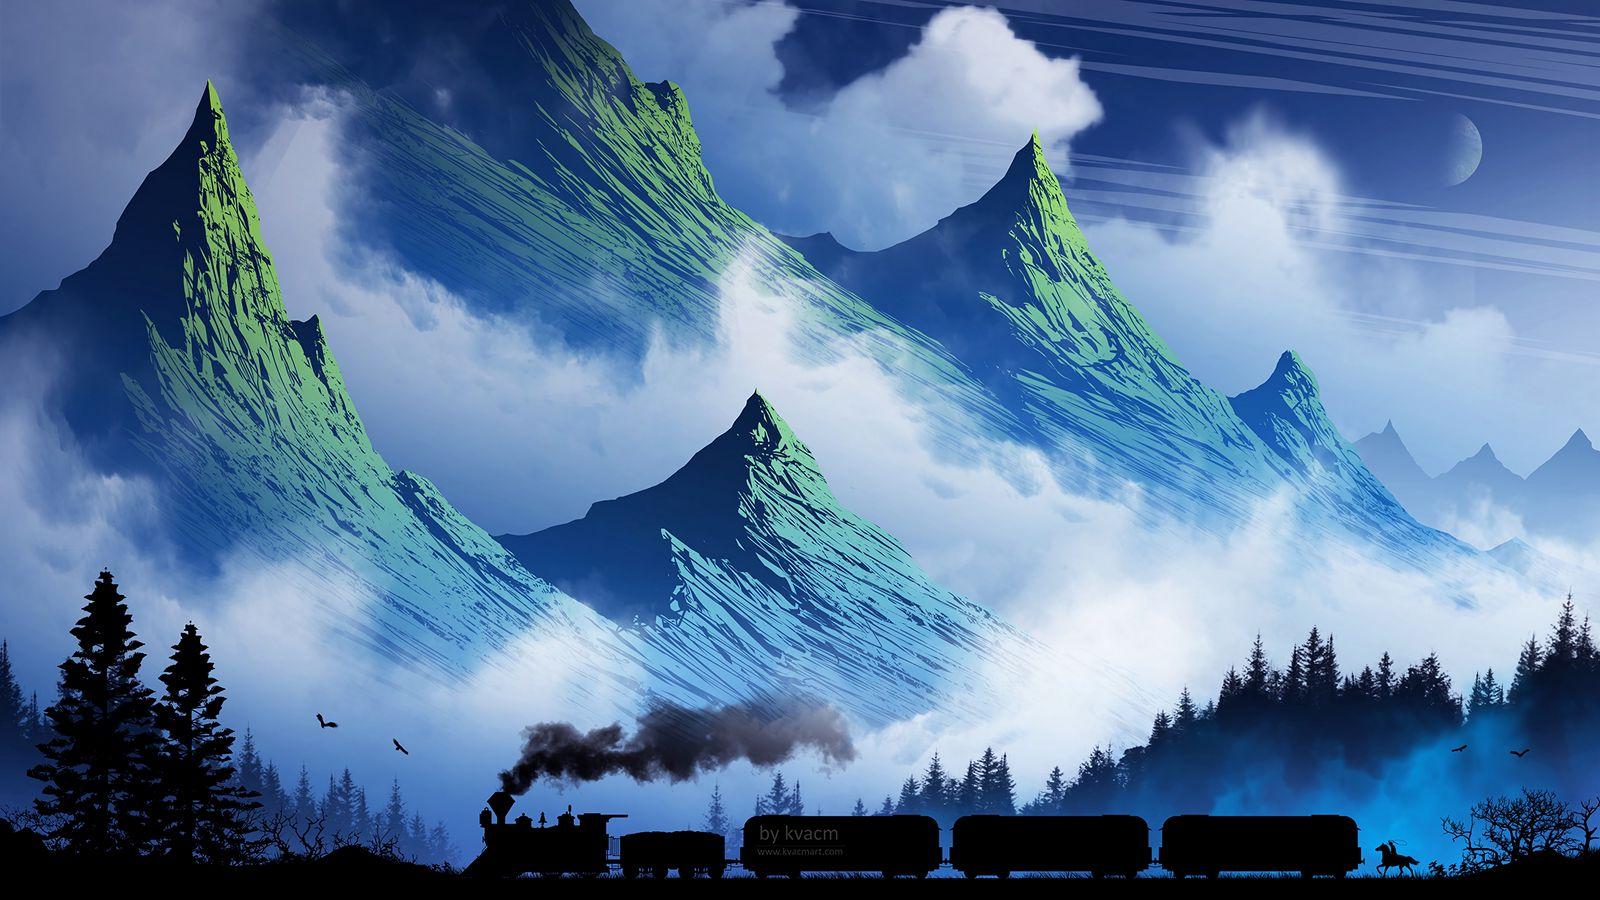 1600x900 Wallpaper train, mountains, art, fog, smoke